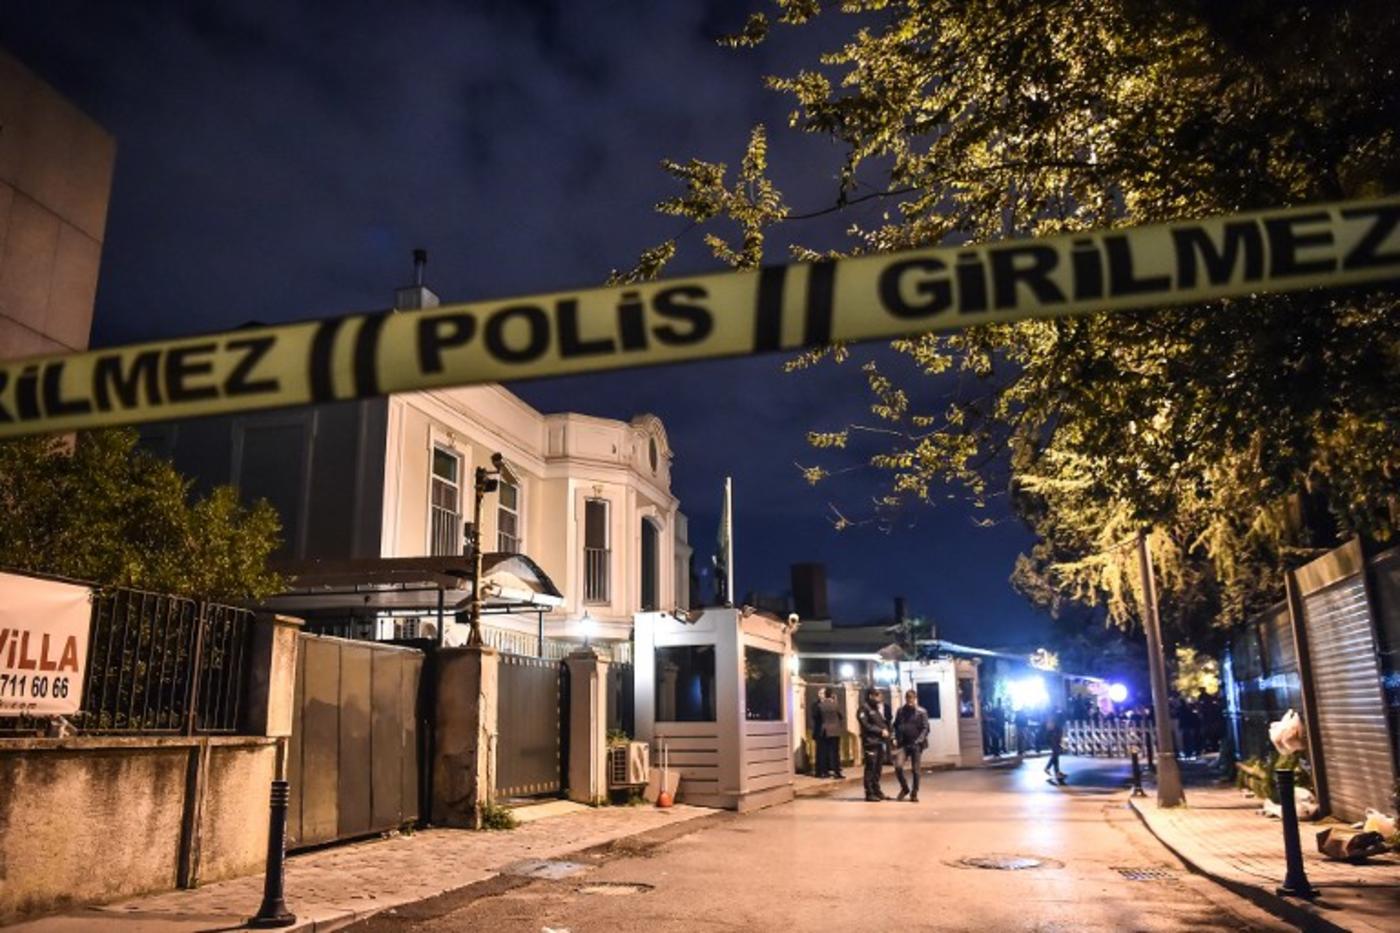 Jamal Khashoggi's killing took seven minutes, Turkish source tells